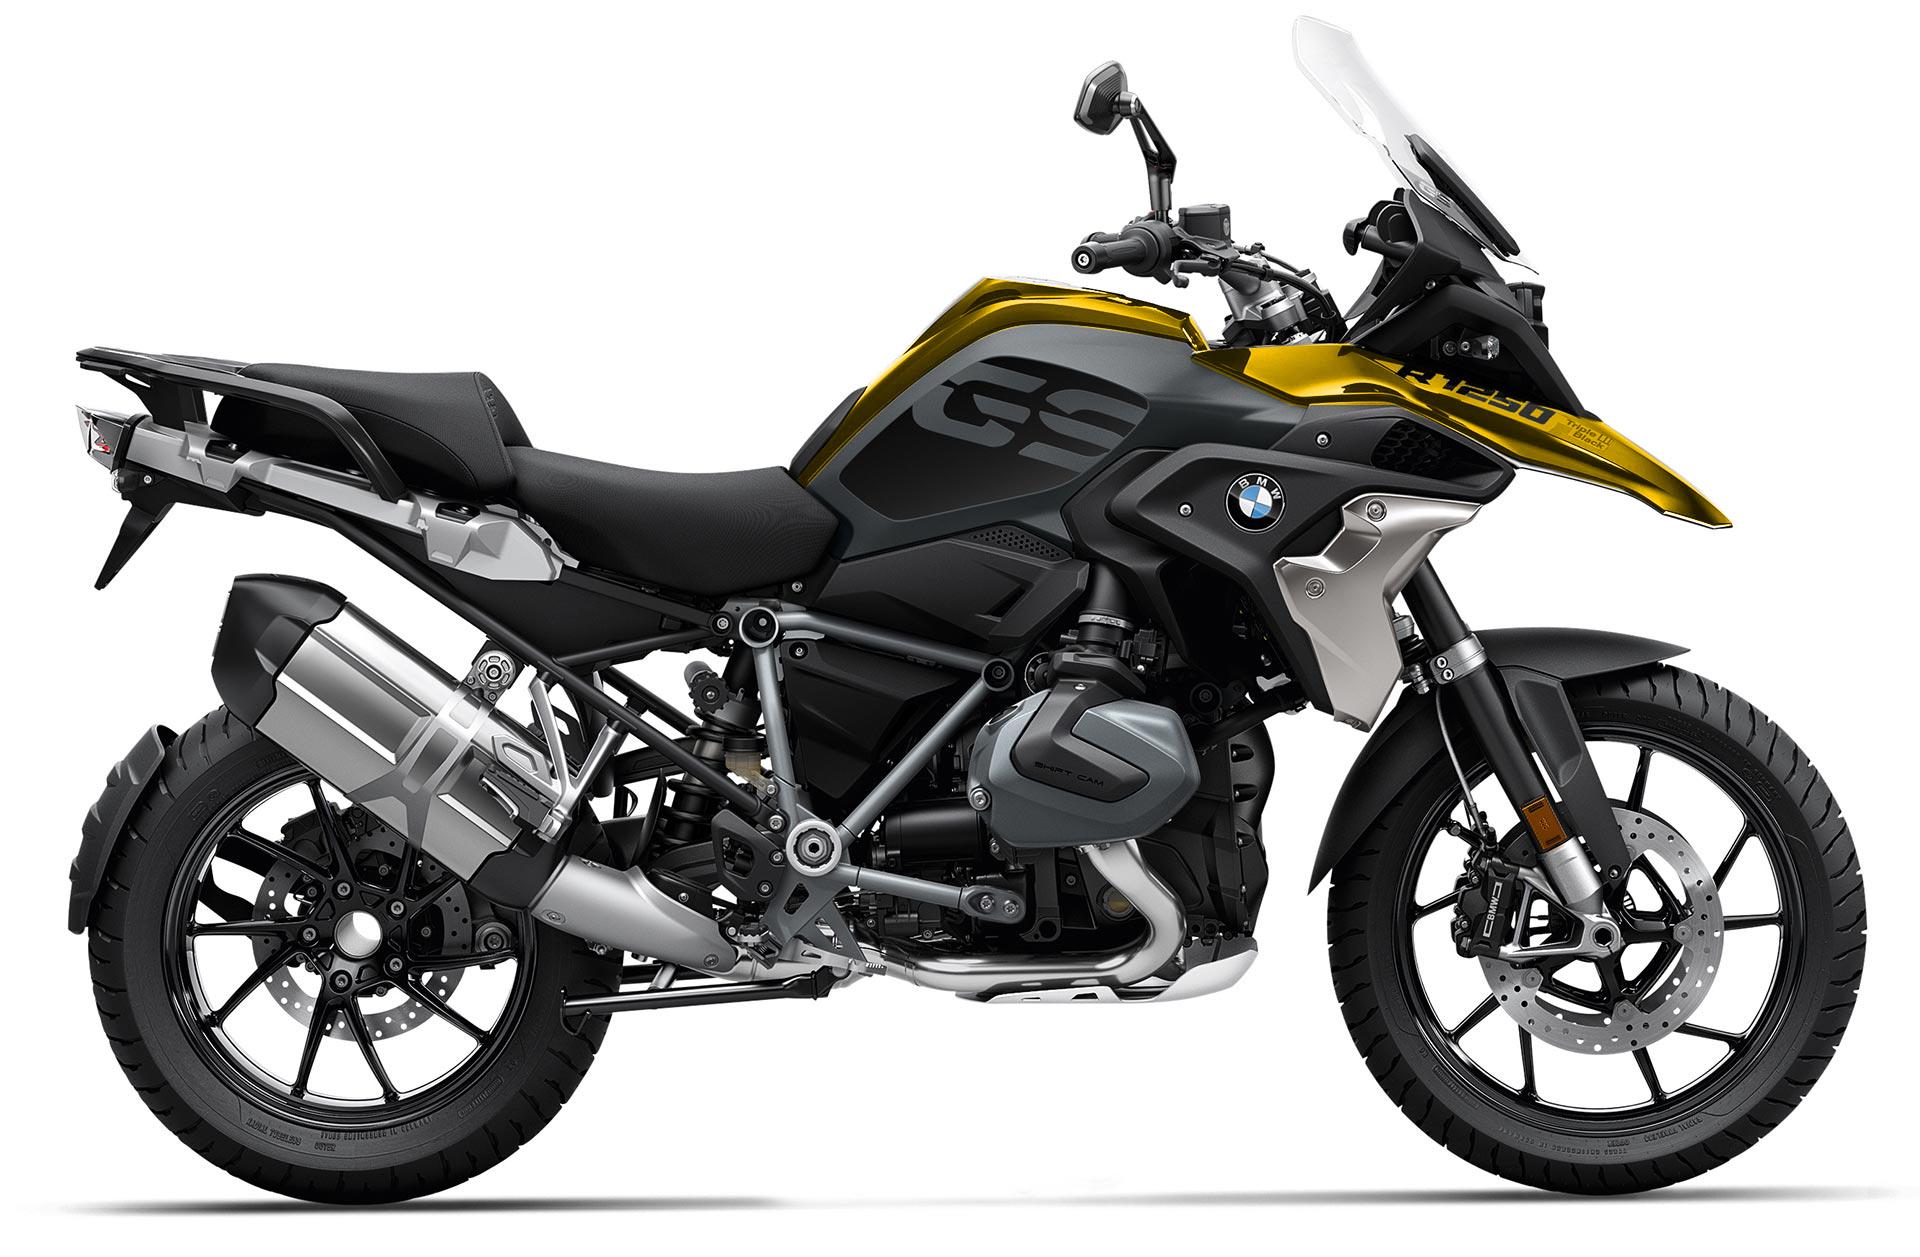 2021-BMW-R1250GS-TripleBlack-Gelb.png